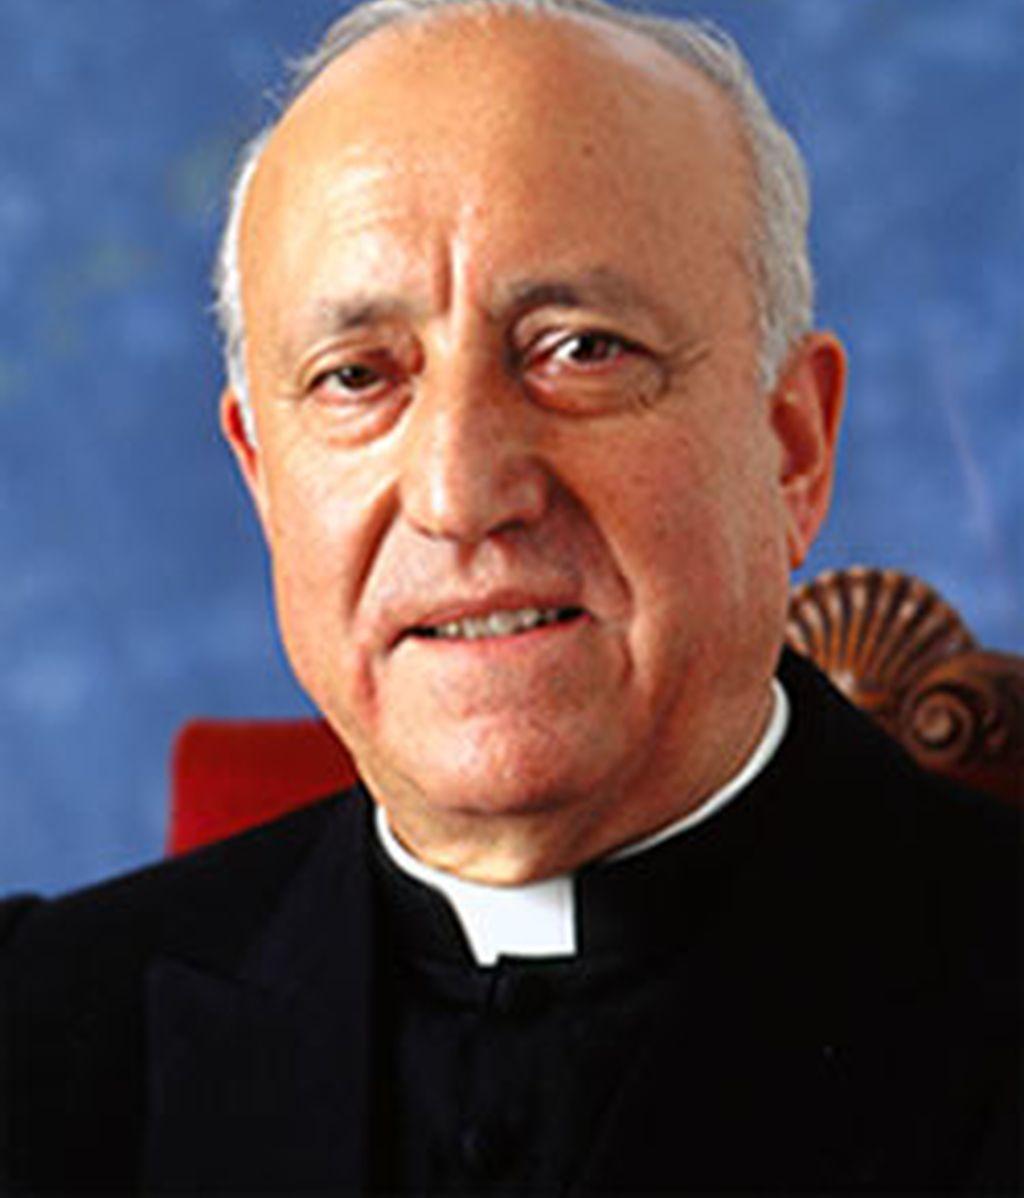 El cardenal Agustín García-Gasco.